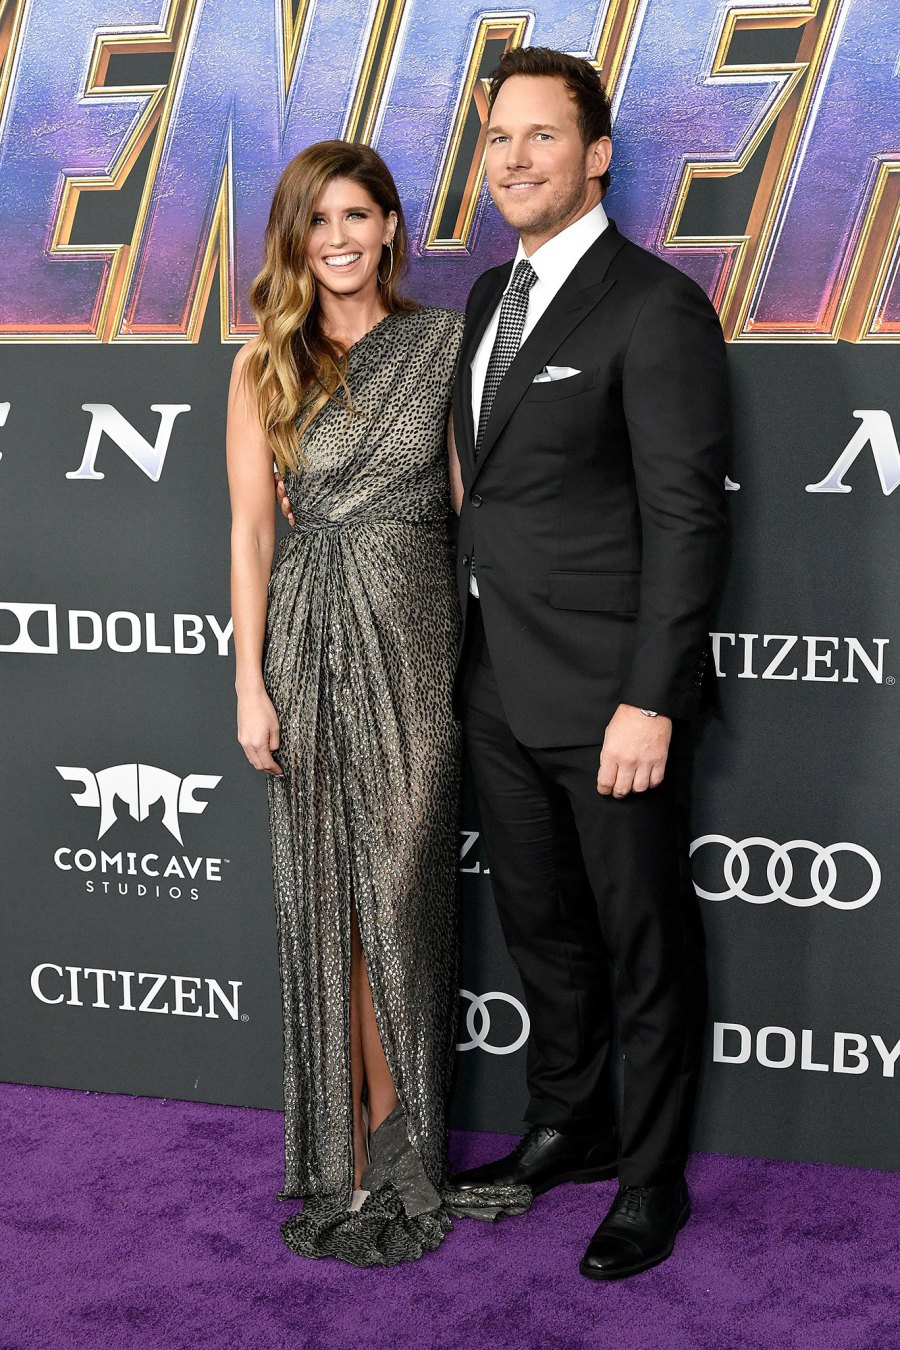 Chris Pratt and Katherine Schwarzenegger Sweetest Quotes